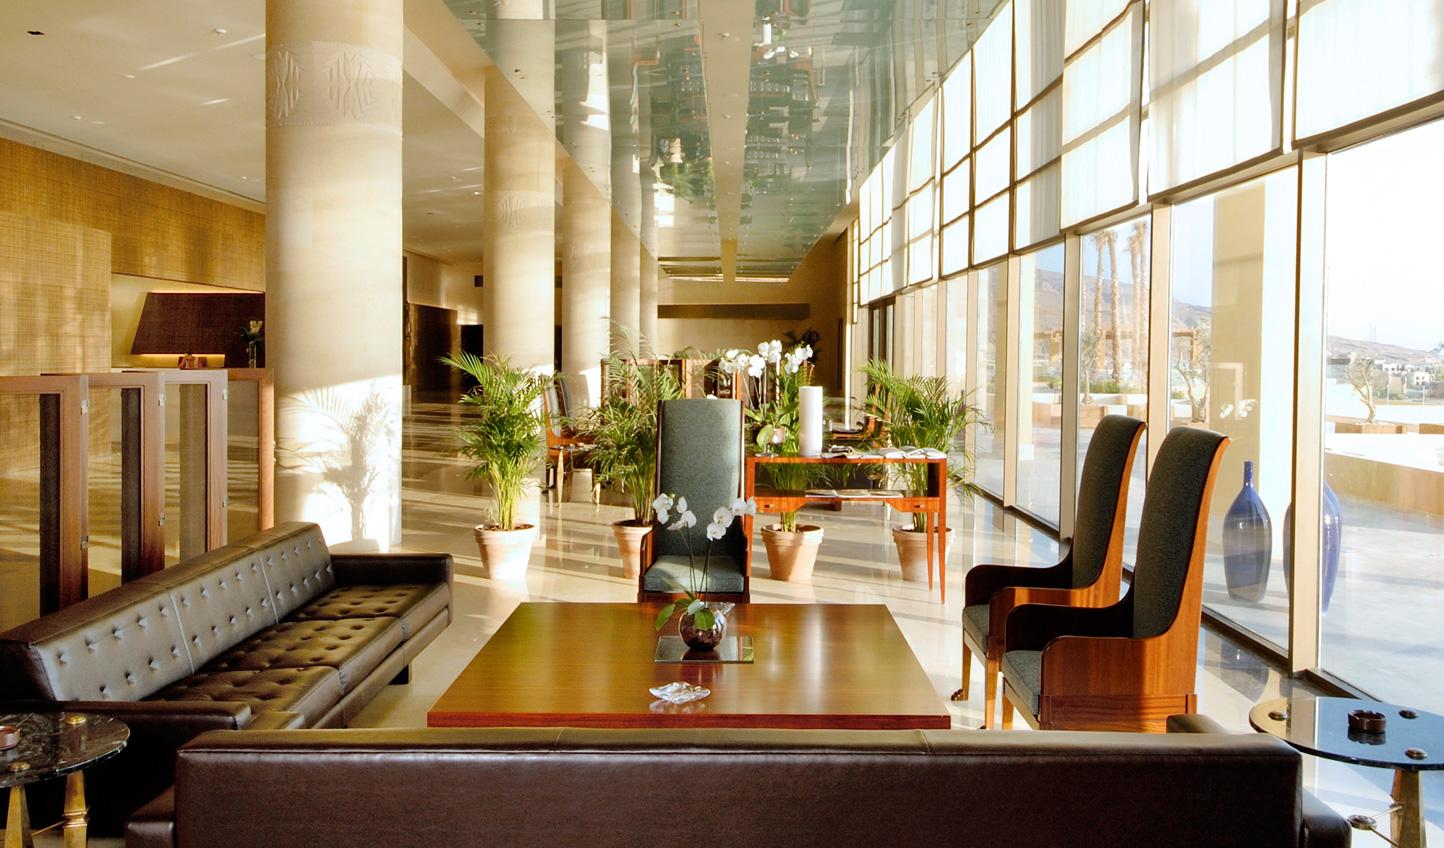 Modern design runs through the Kempinski Hotel Ishtar